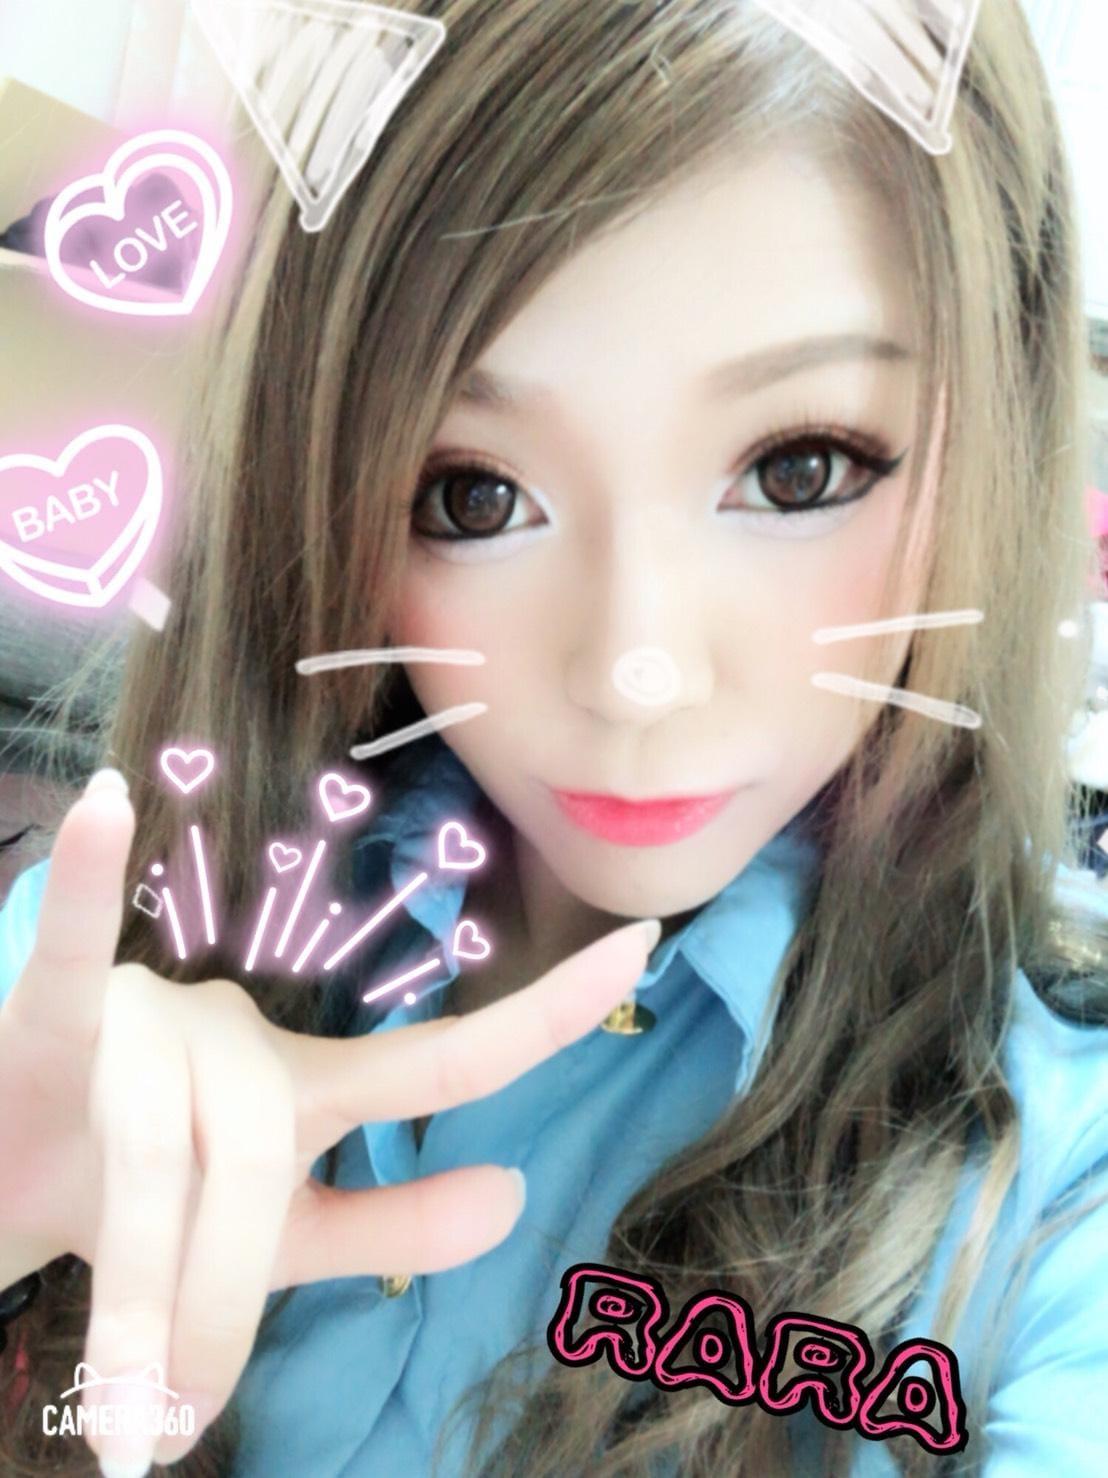 「【Q&A】☆..:*・」10/15(月) 03:16 | らら(きれい系)の写メ・風俗動画